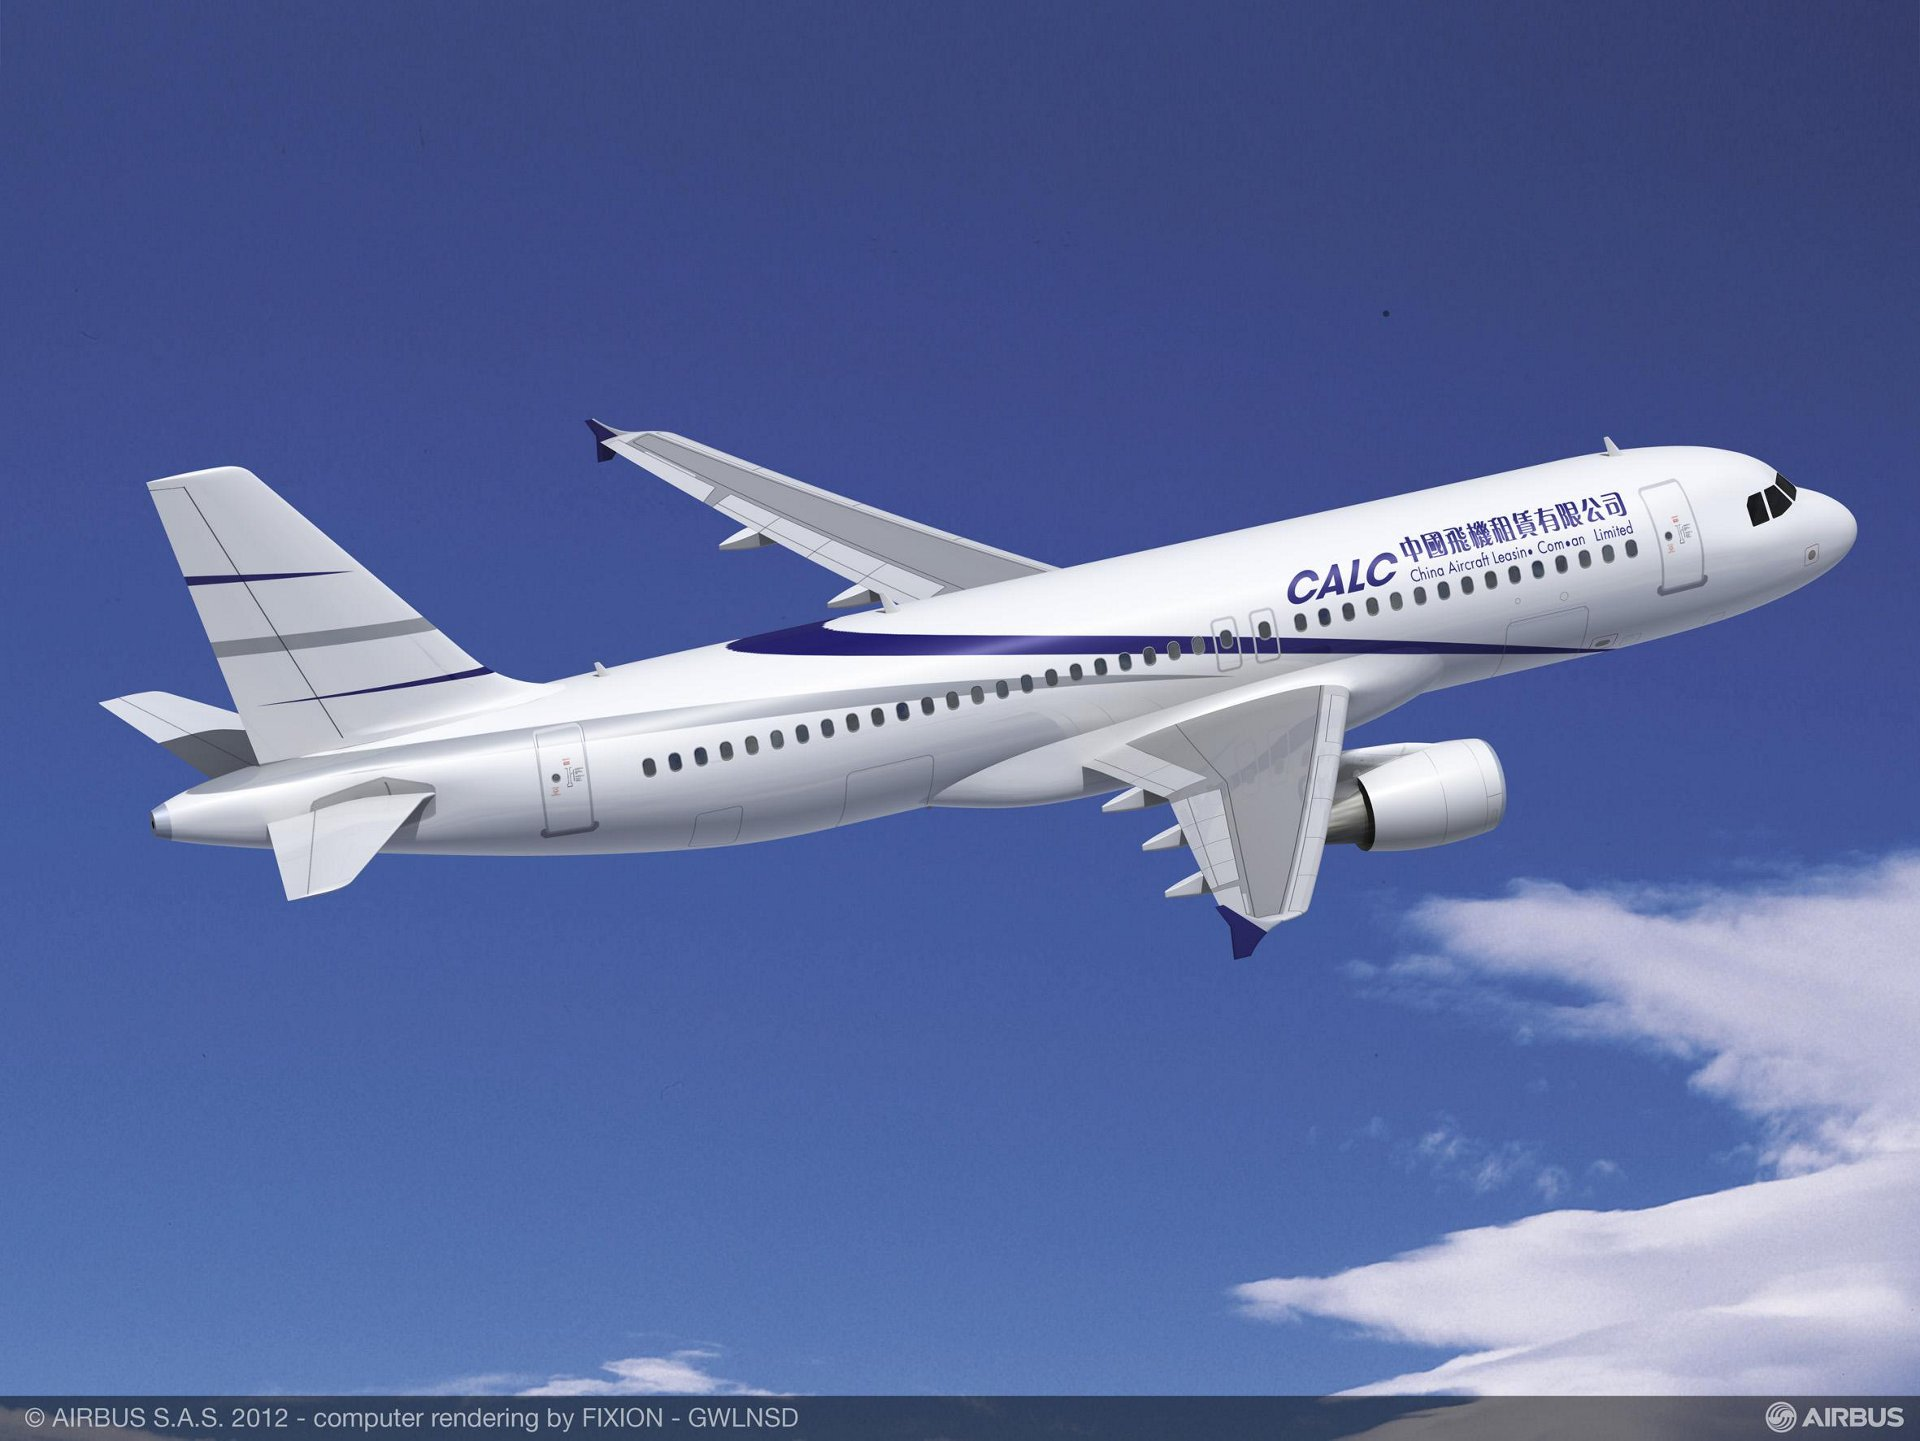 A320 CALC CFM